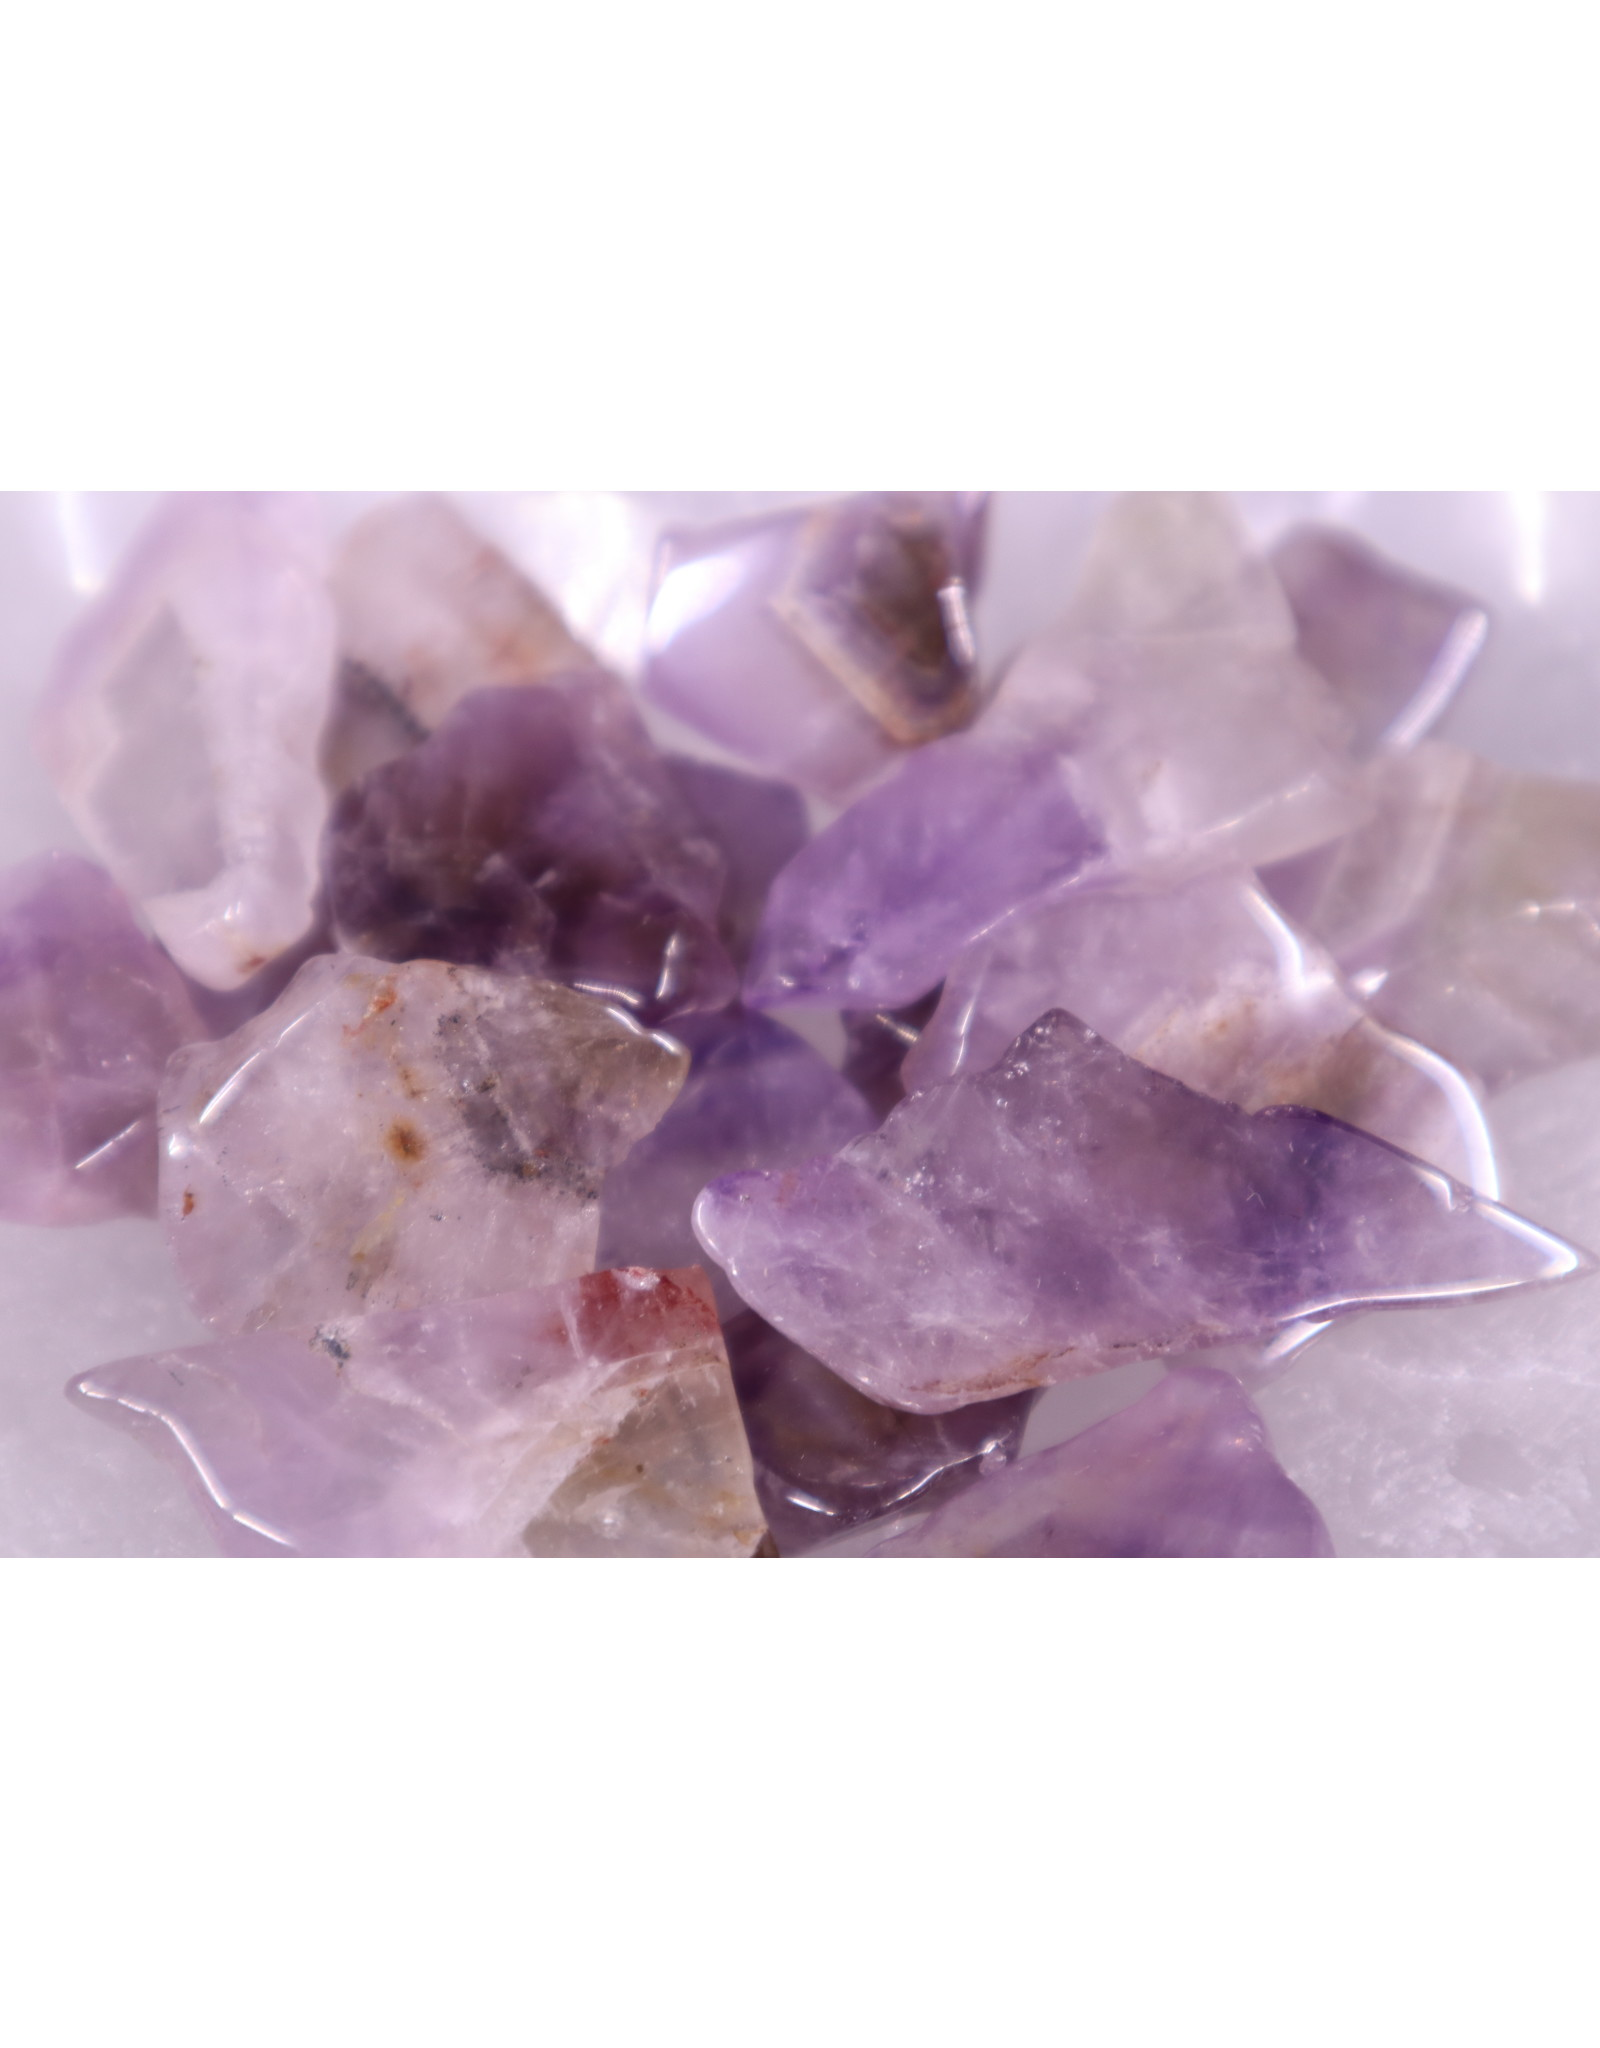 Auralite 23 Slice - Small